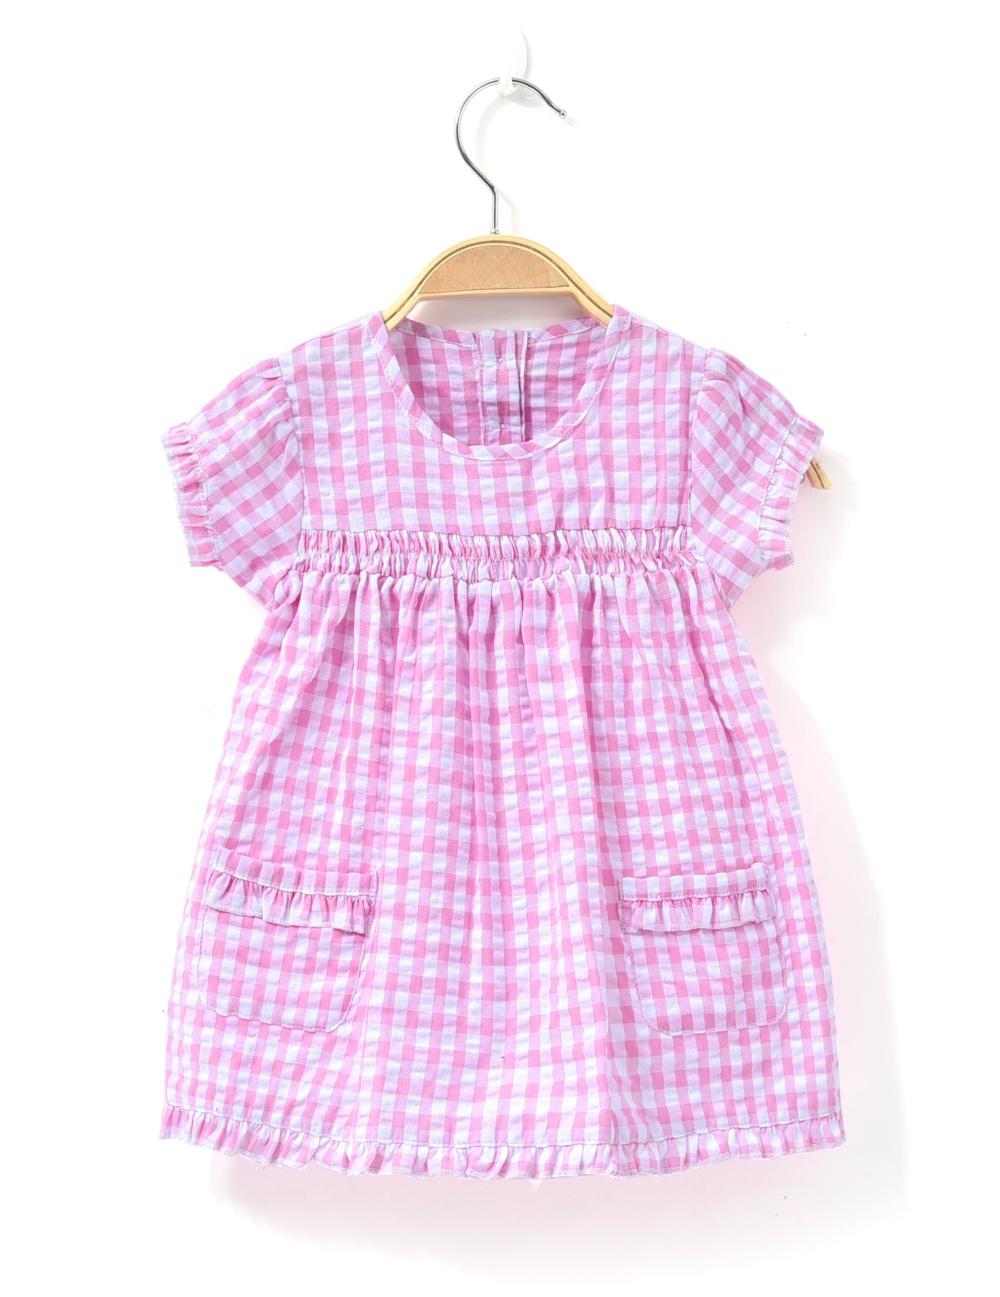 Aliexpress Buy fancy newborn baby girls summer dress